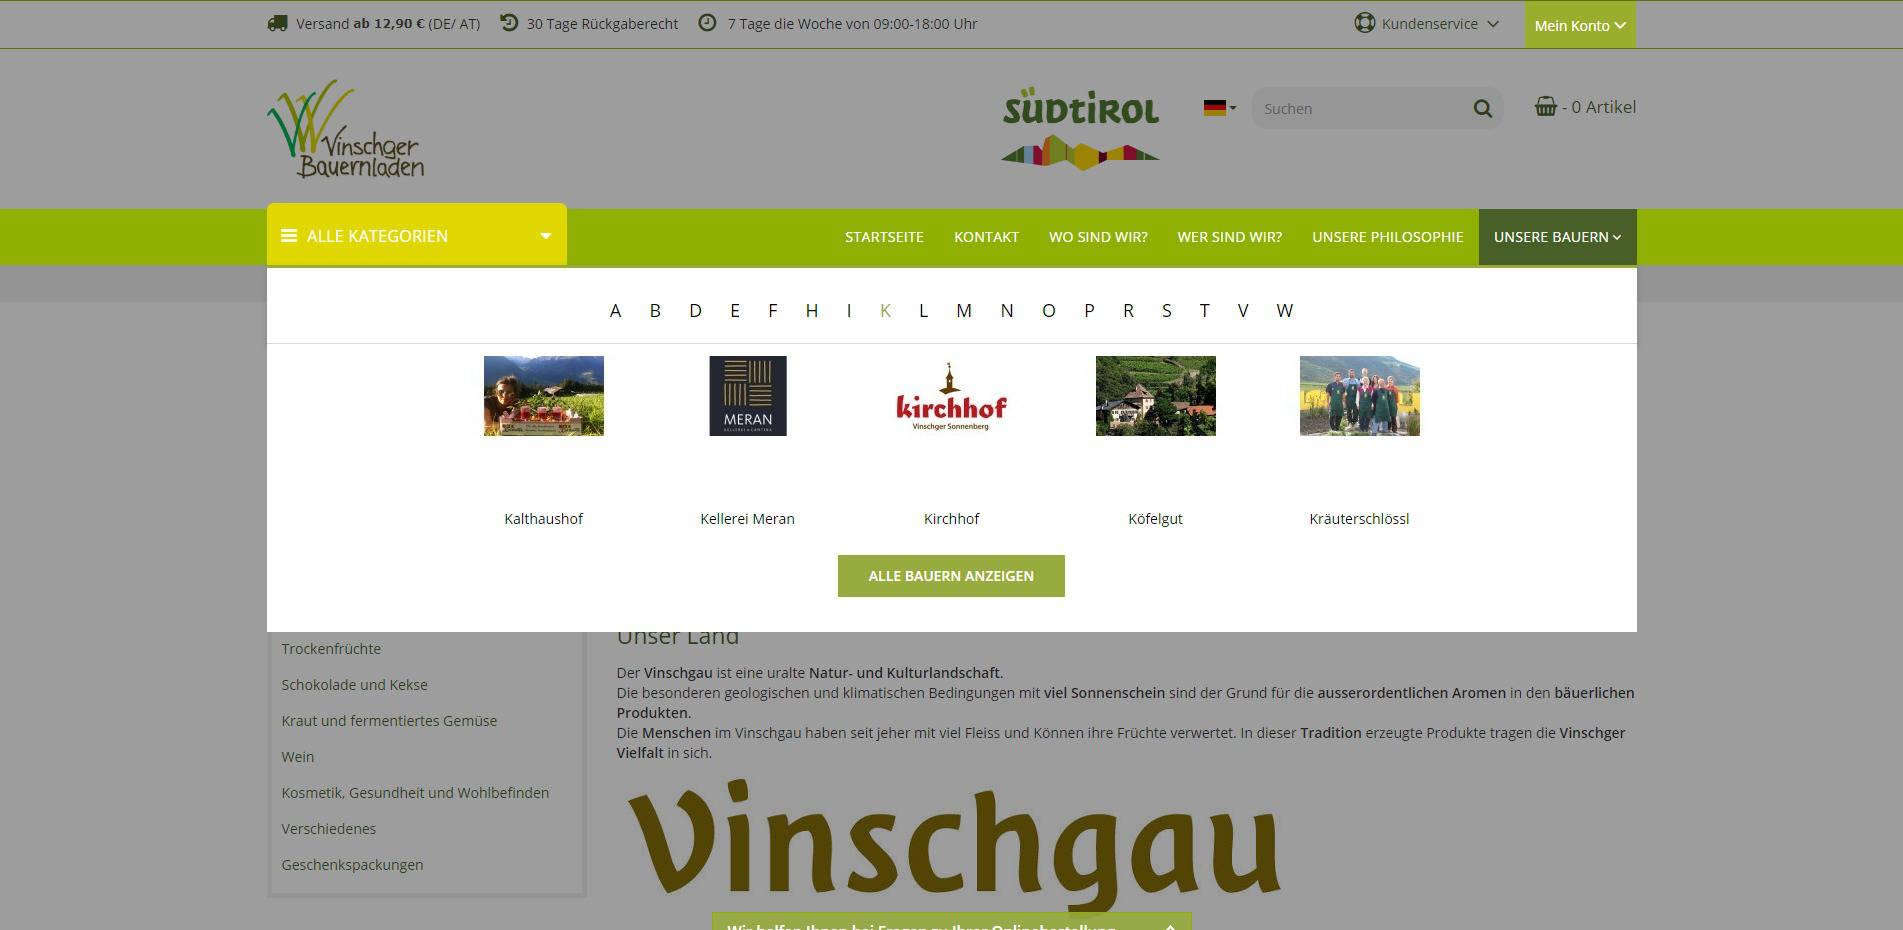 Vinschger Bauerladen Produzenten